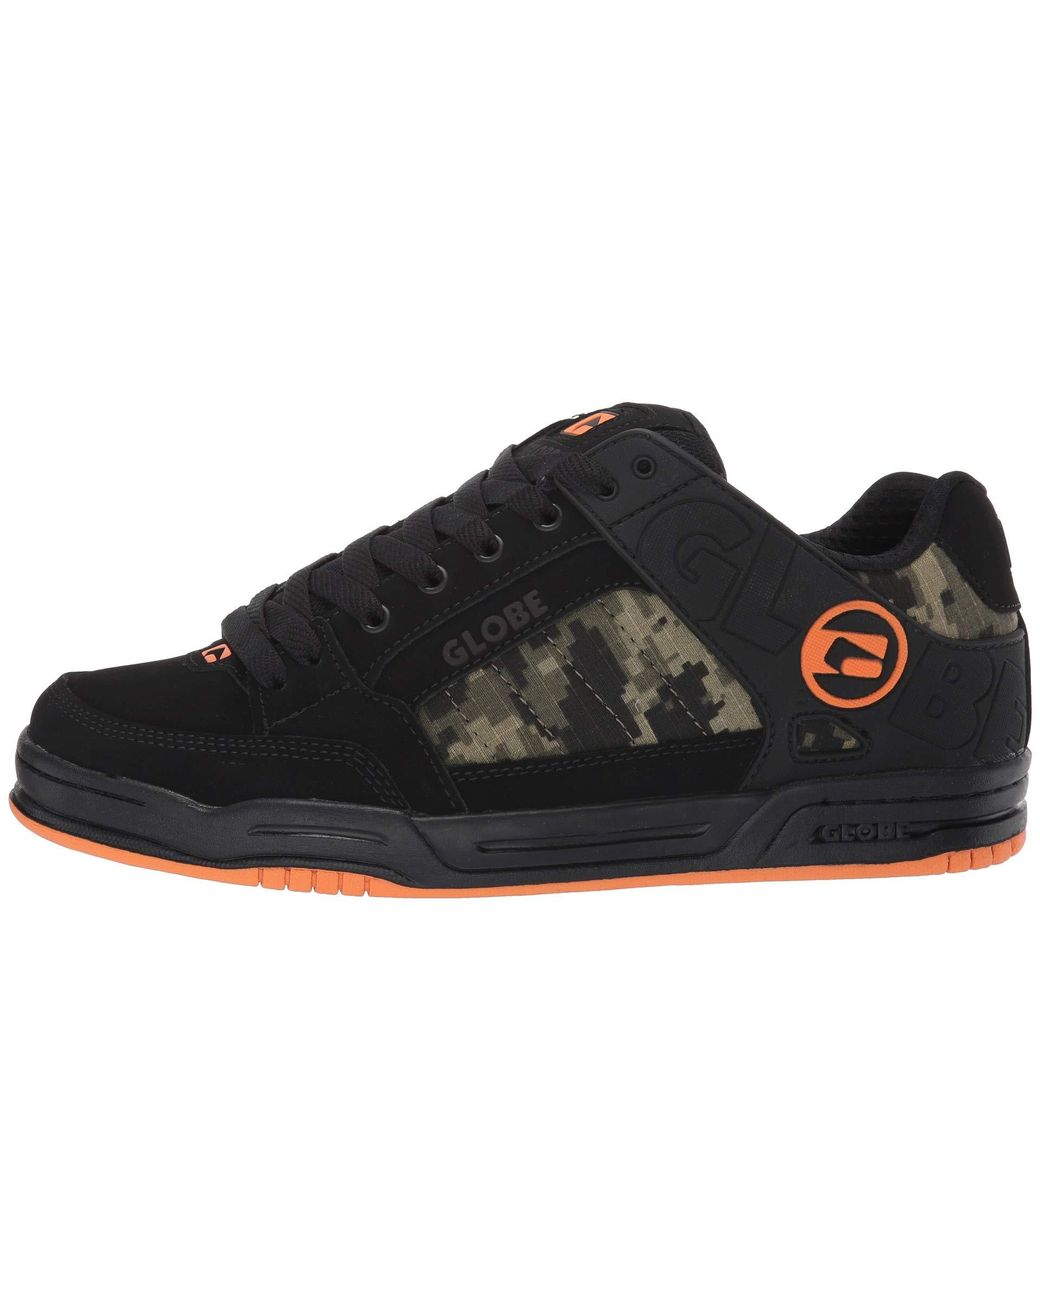 4d29d6c87f Lyst - Globe Tilt (black red grey Knit) Men s Skate Shoes in Black for Men